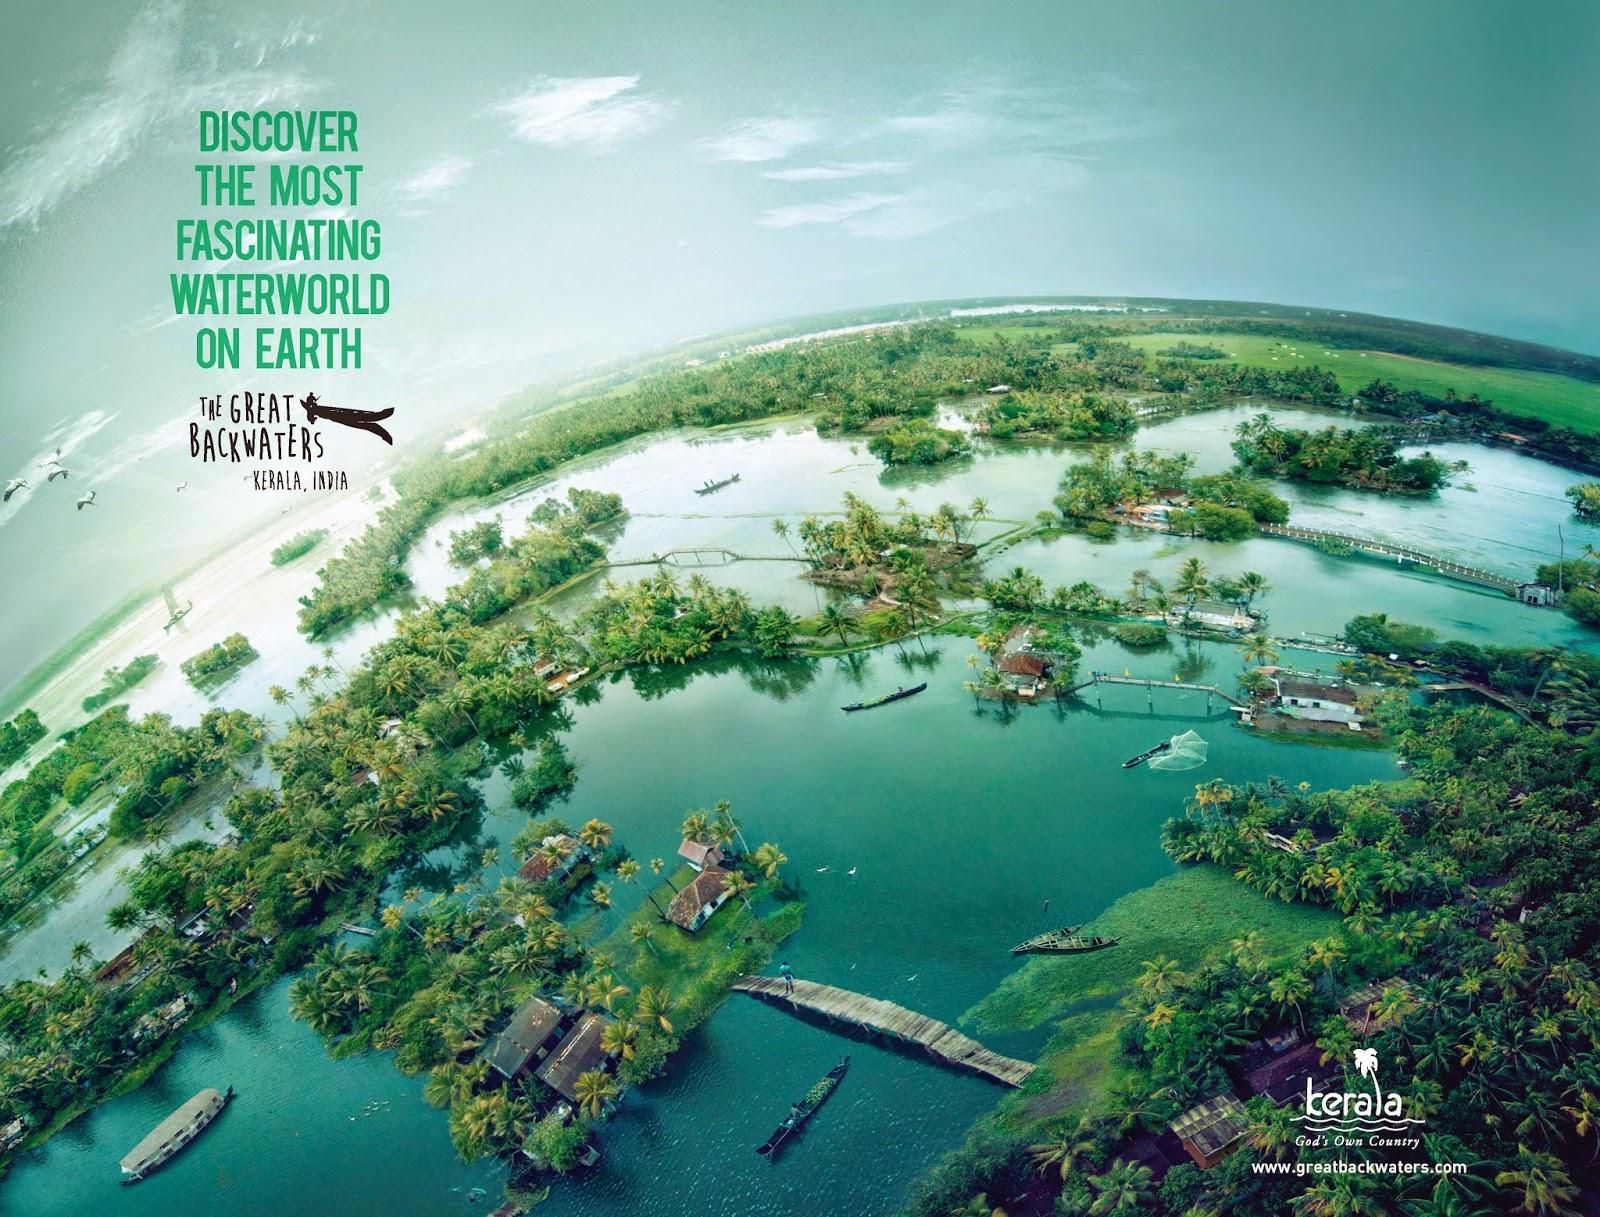 The Great Backwaters Campaign | Kerala Tourism | New Water World - Backwaters of Kerala 1 | Stark Communications Pvt Ltd